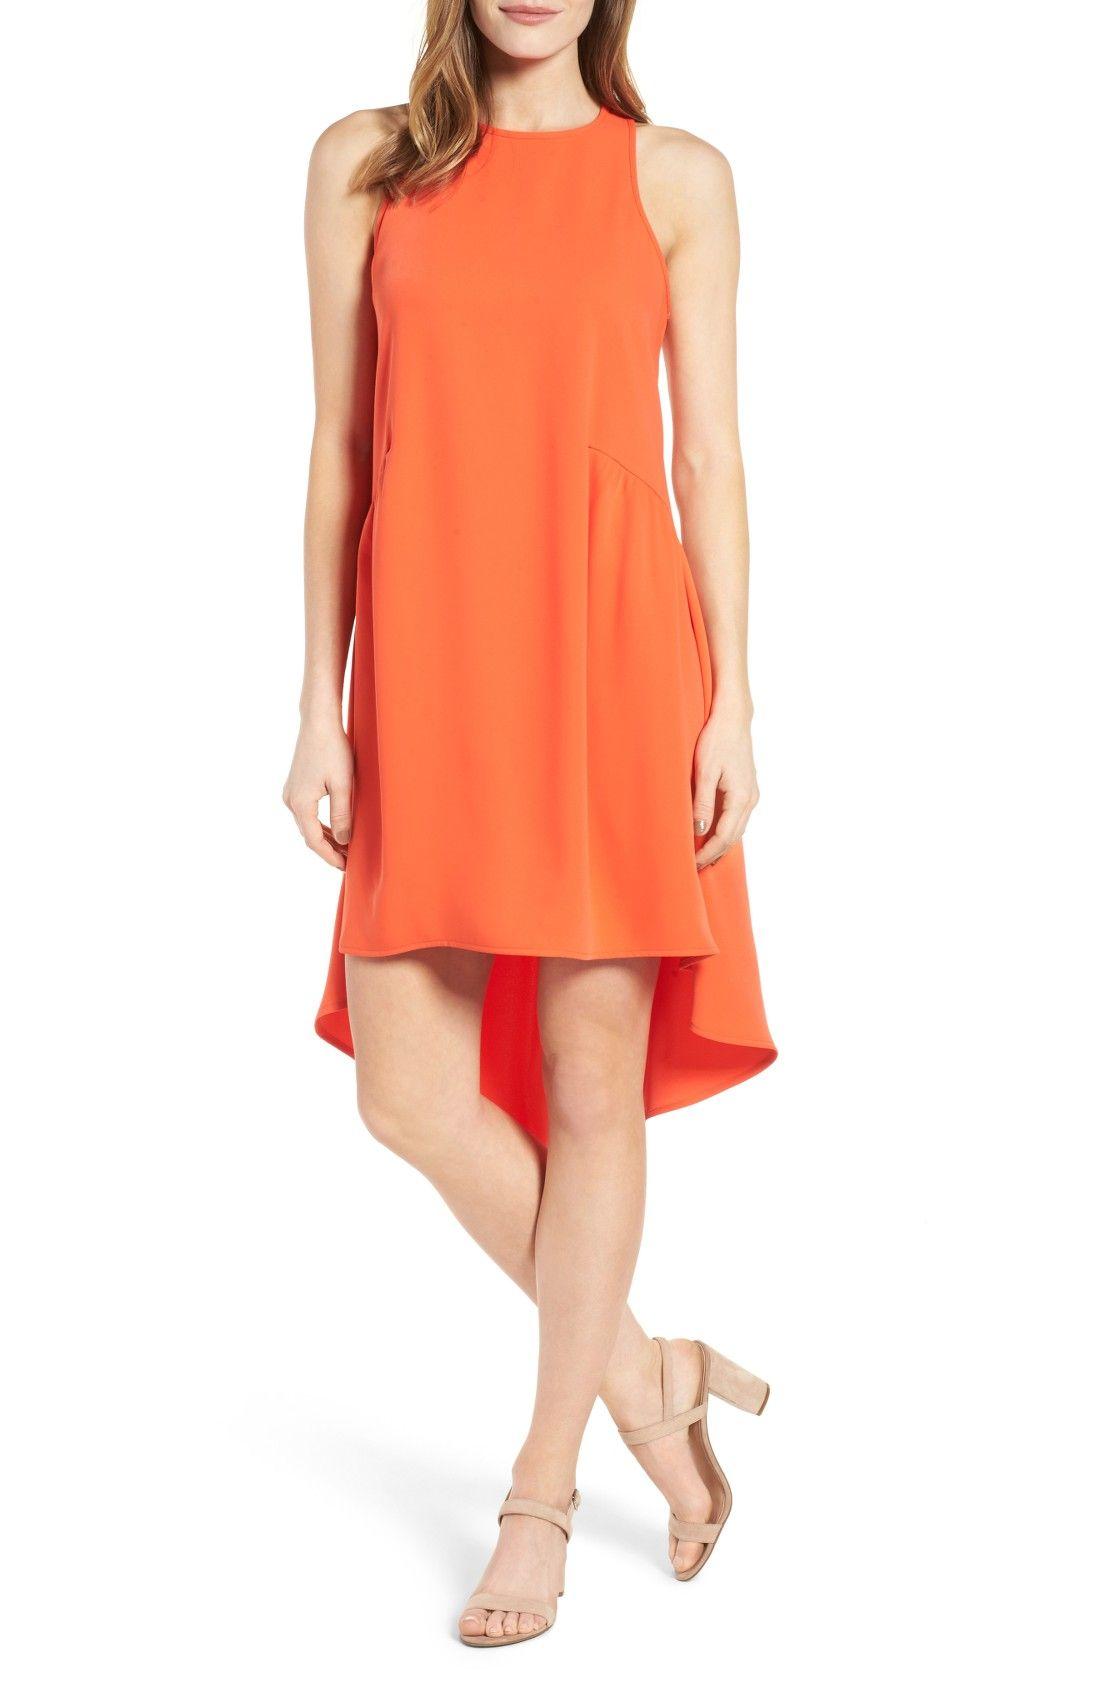 best ideas about orange cocktail dresses on pinterest icra